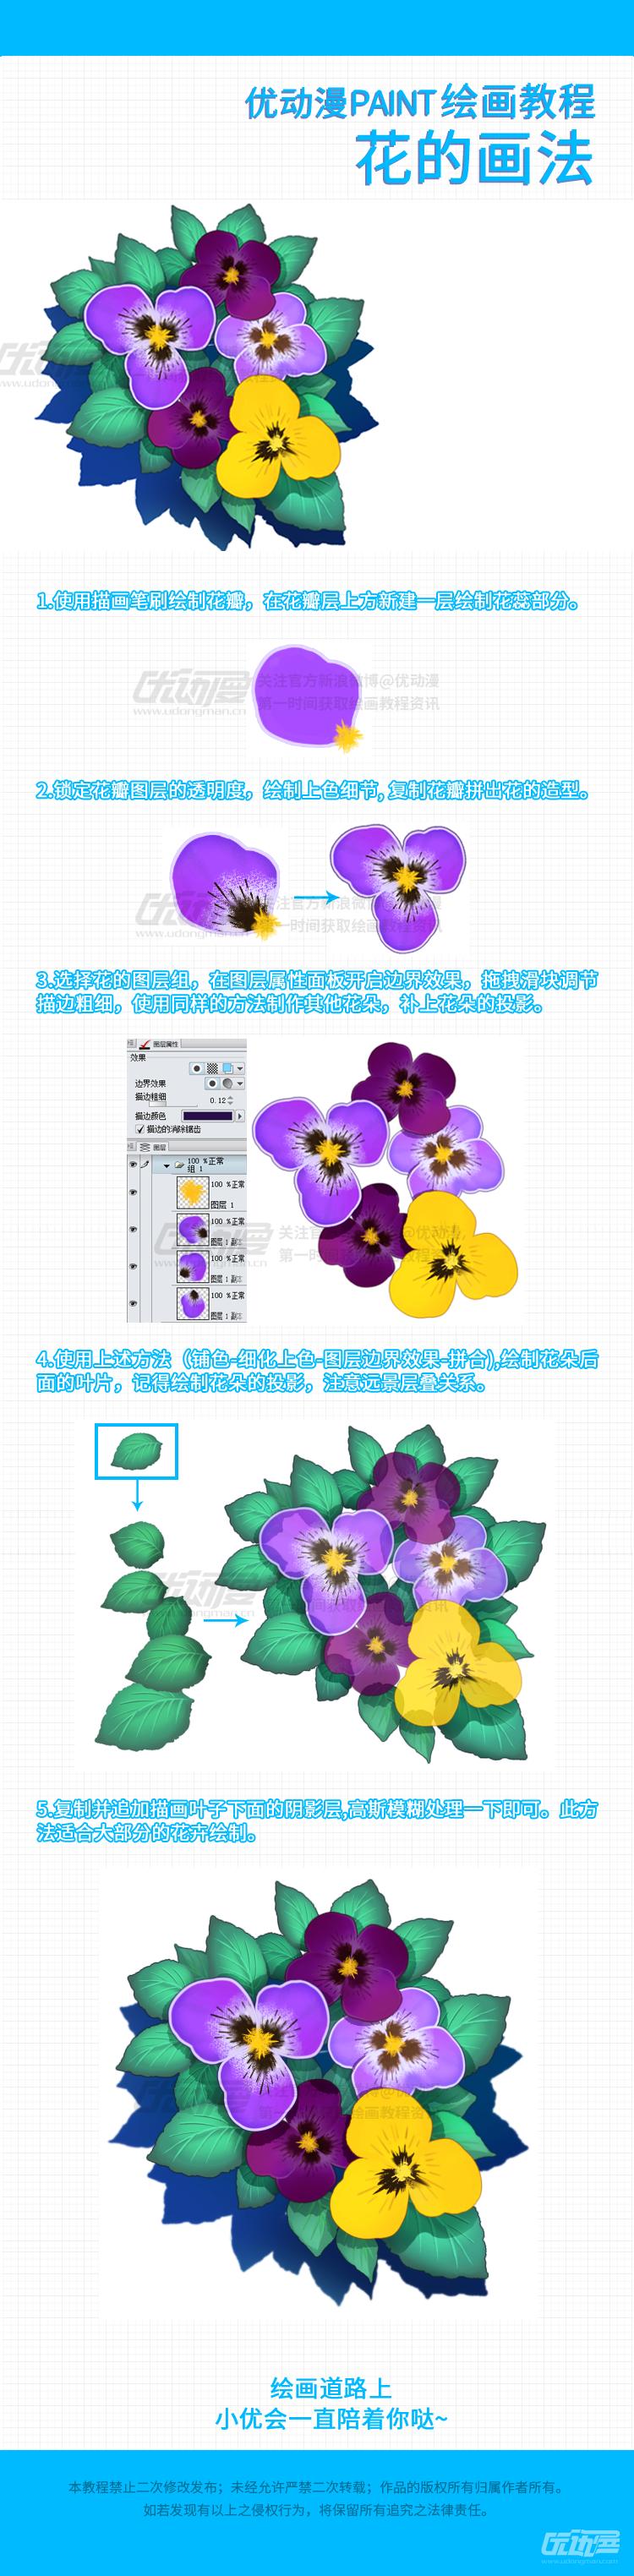 花的画法.png